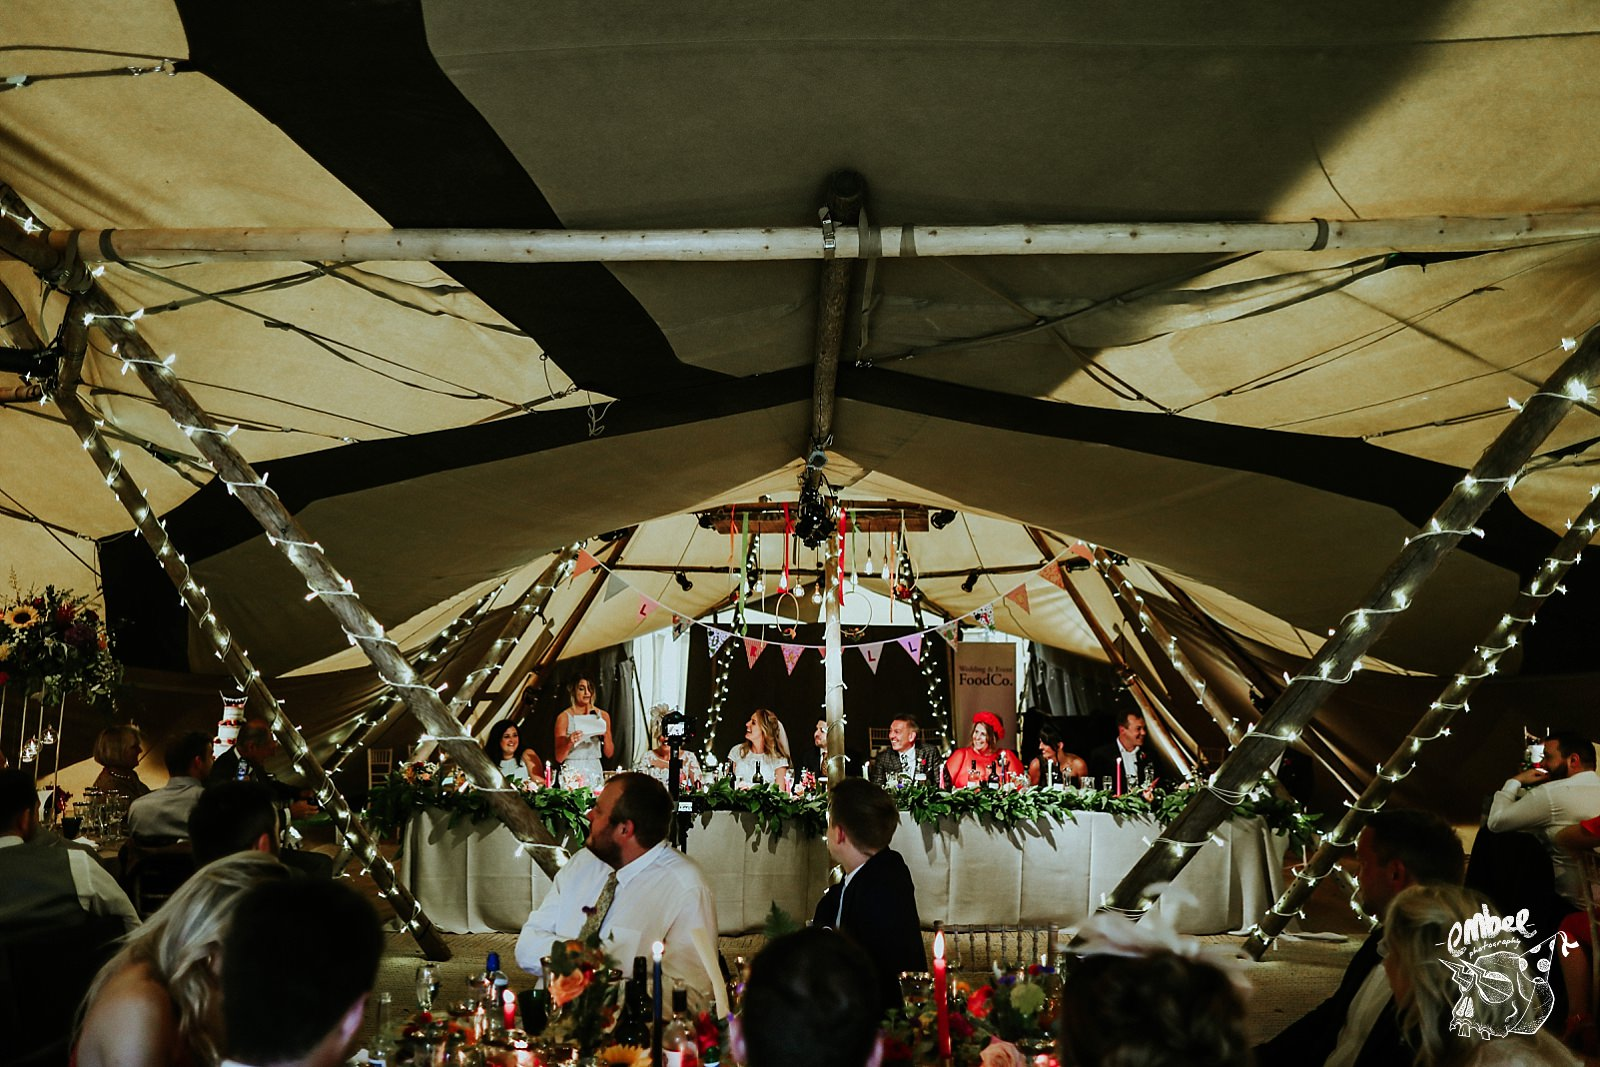 inside shot of the wedding tipi